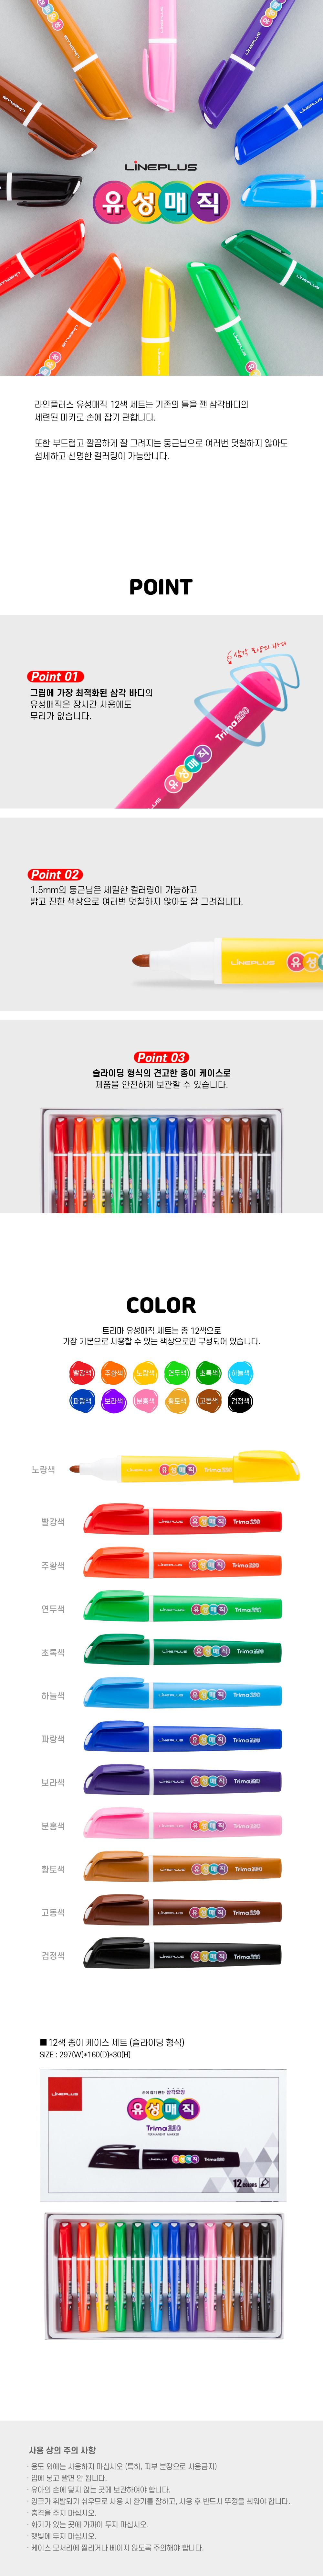 Lineplus 12색유성매직세트_12개입/1세트 - 빅드림, 5,000원, 데코펜, 유성마카